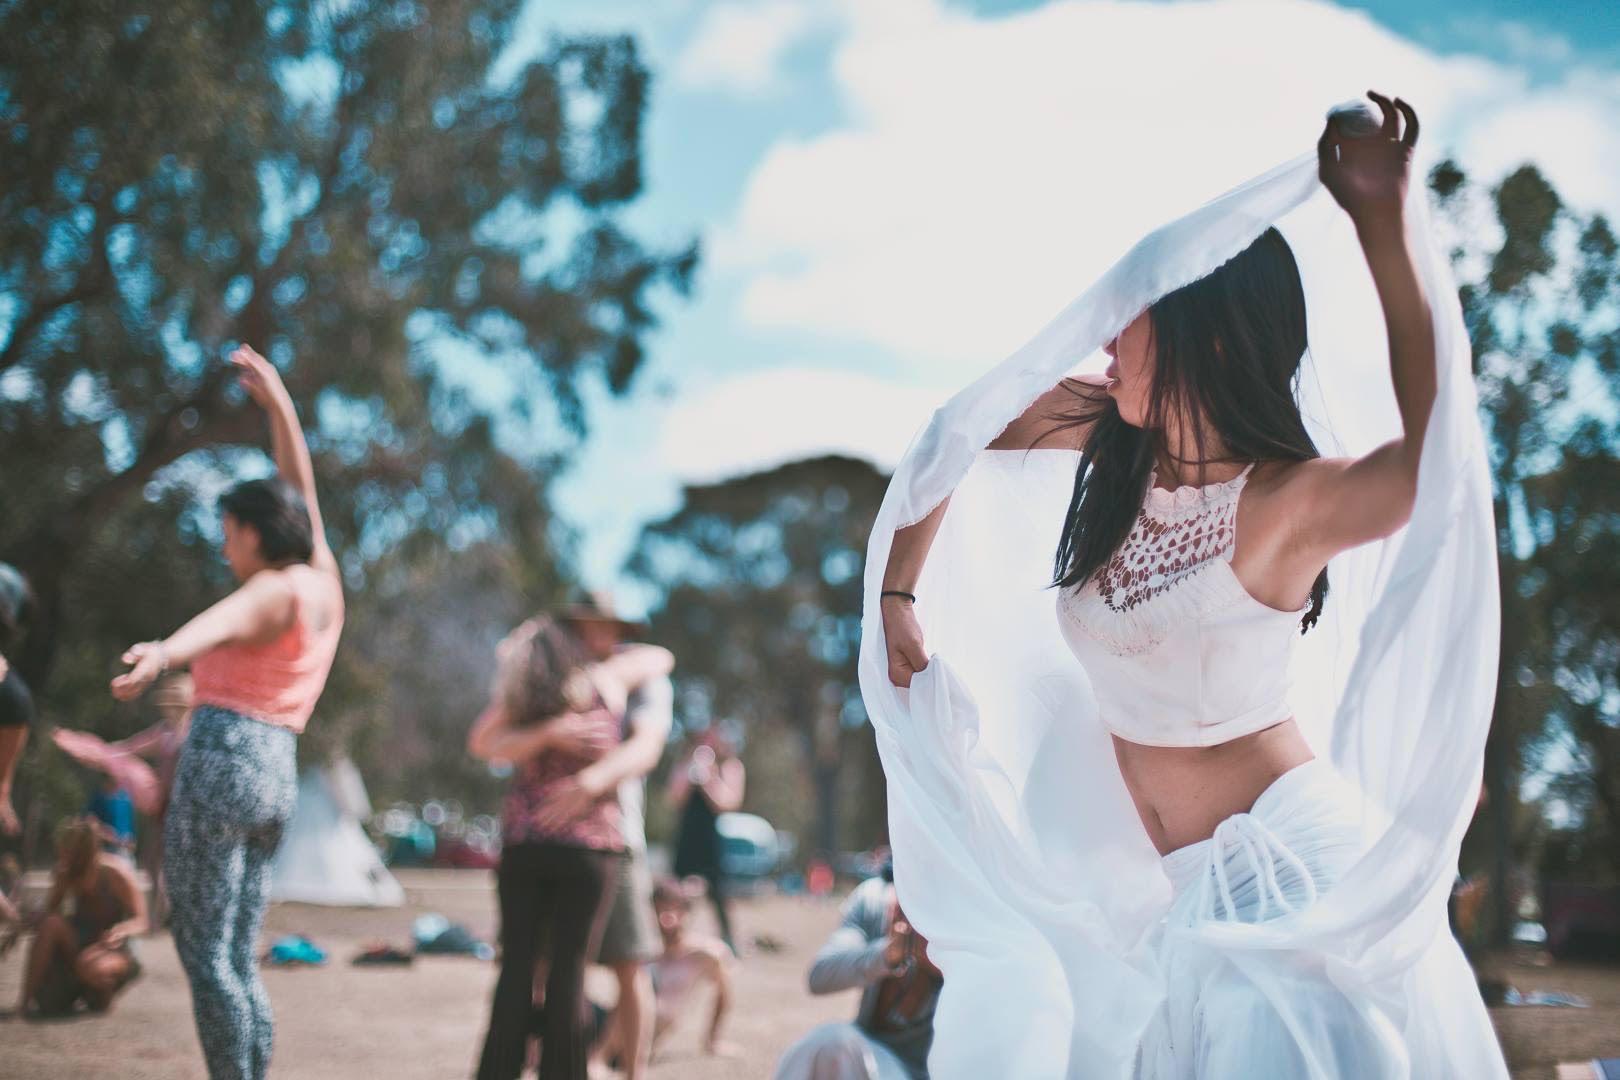 Ecstatic Festival - Melbourne Festivals 2020